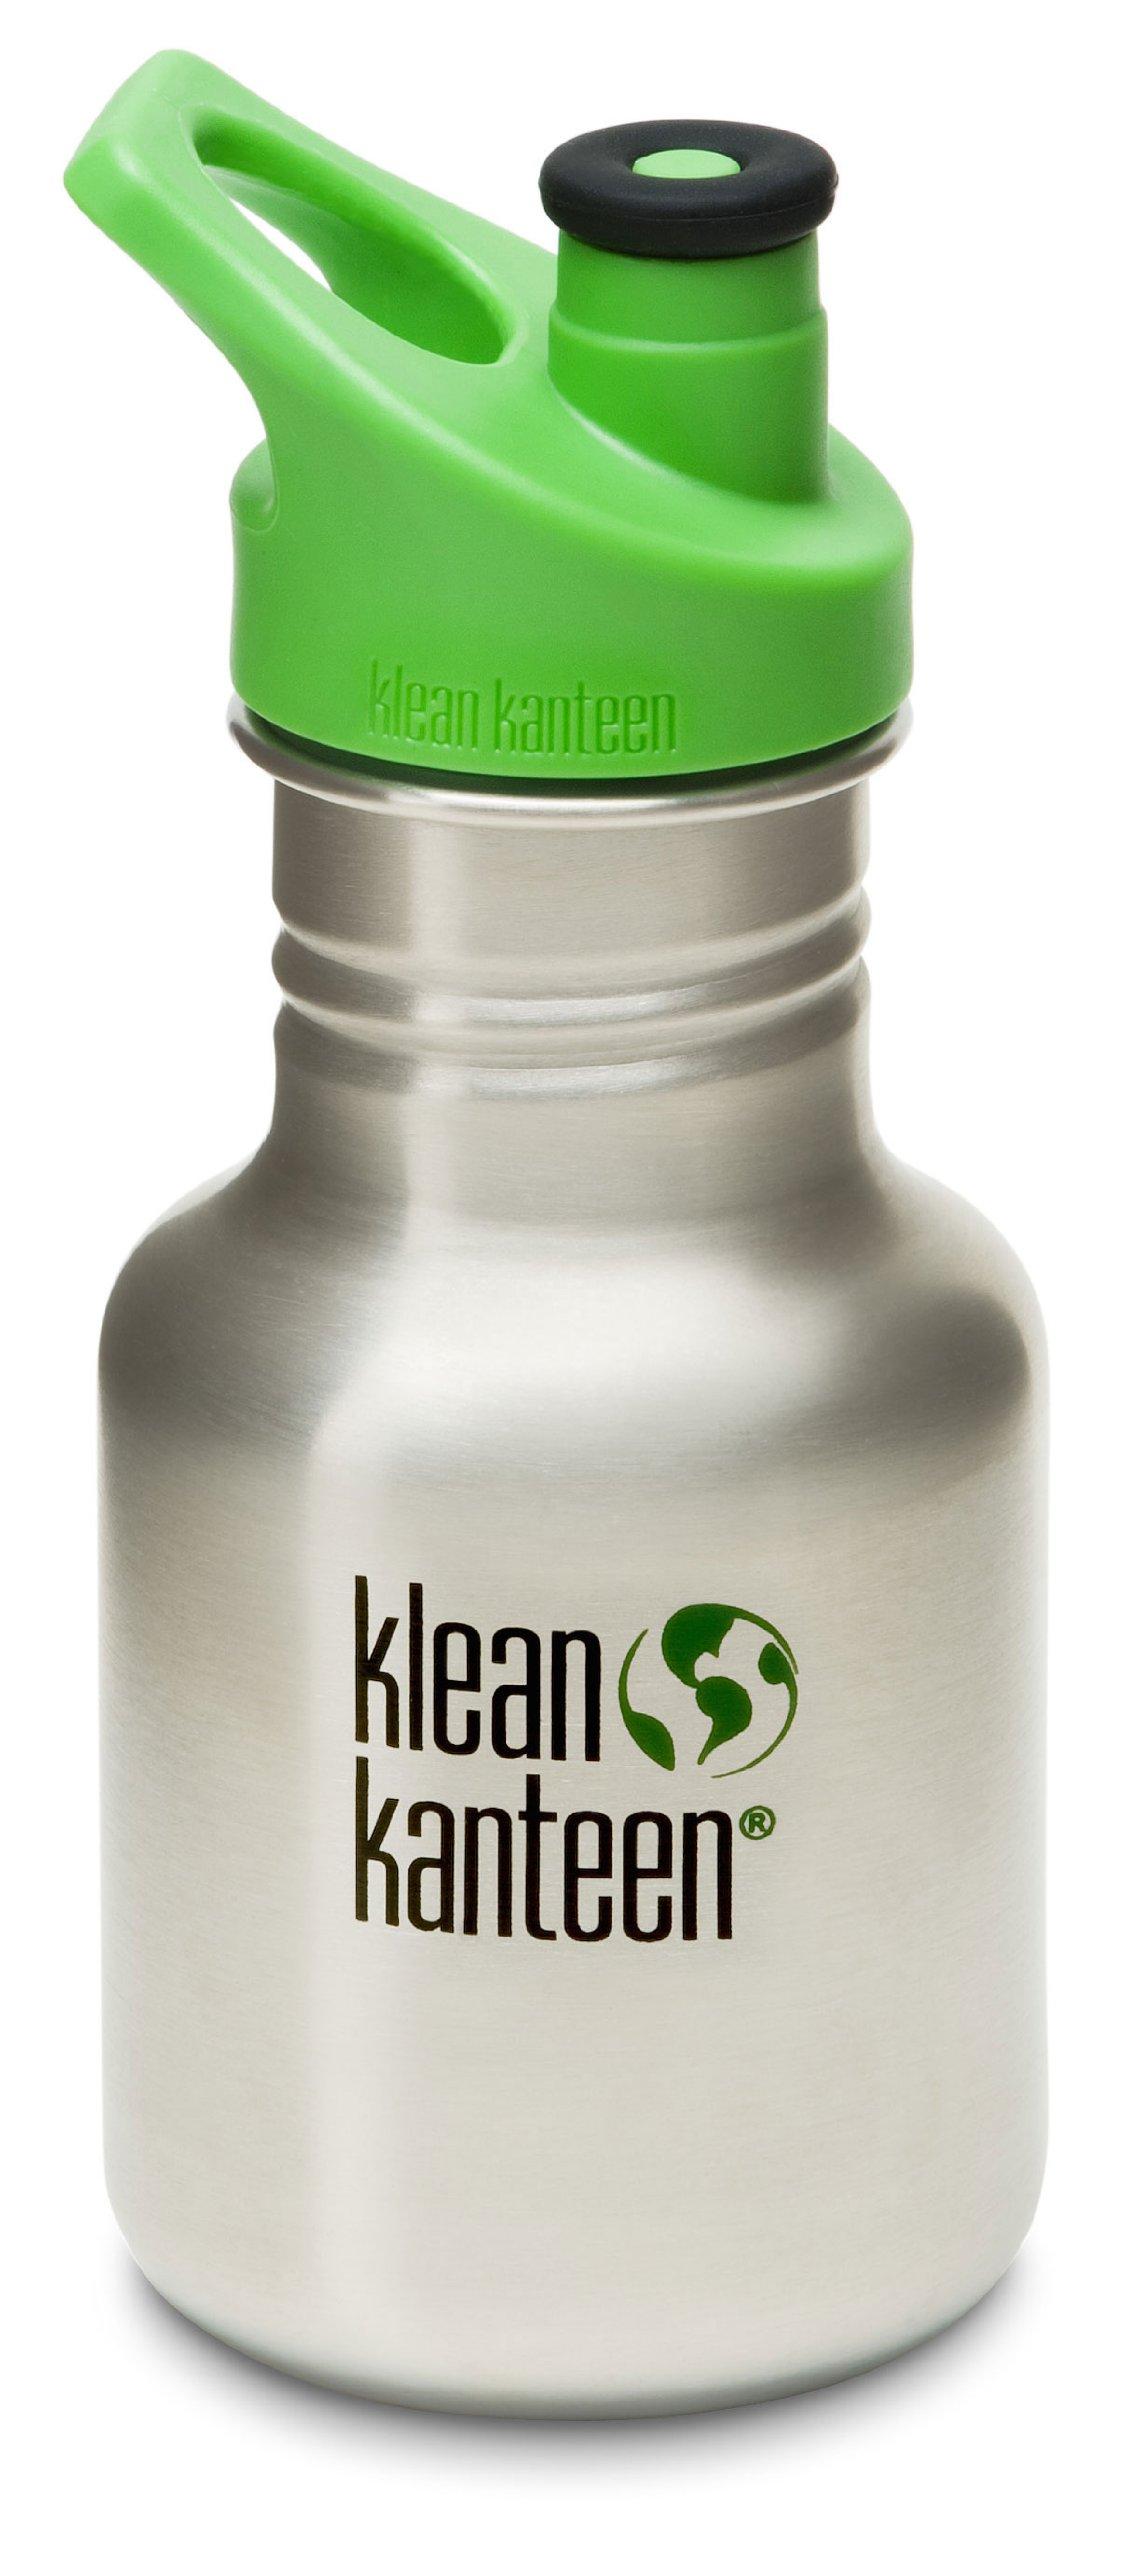 Klean Kanteen Kid Kanteen Classic Sport Single Wall Stainless Steel Kids Water Bottle with Sport Cap 3.0 Brushed Stainless by Klean Kanteen